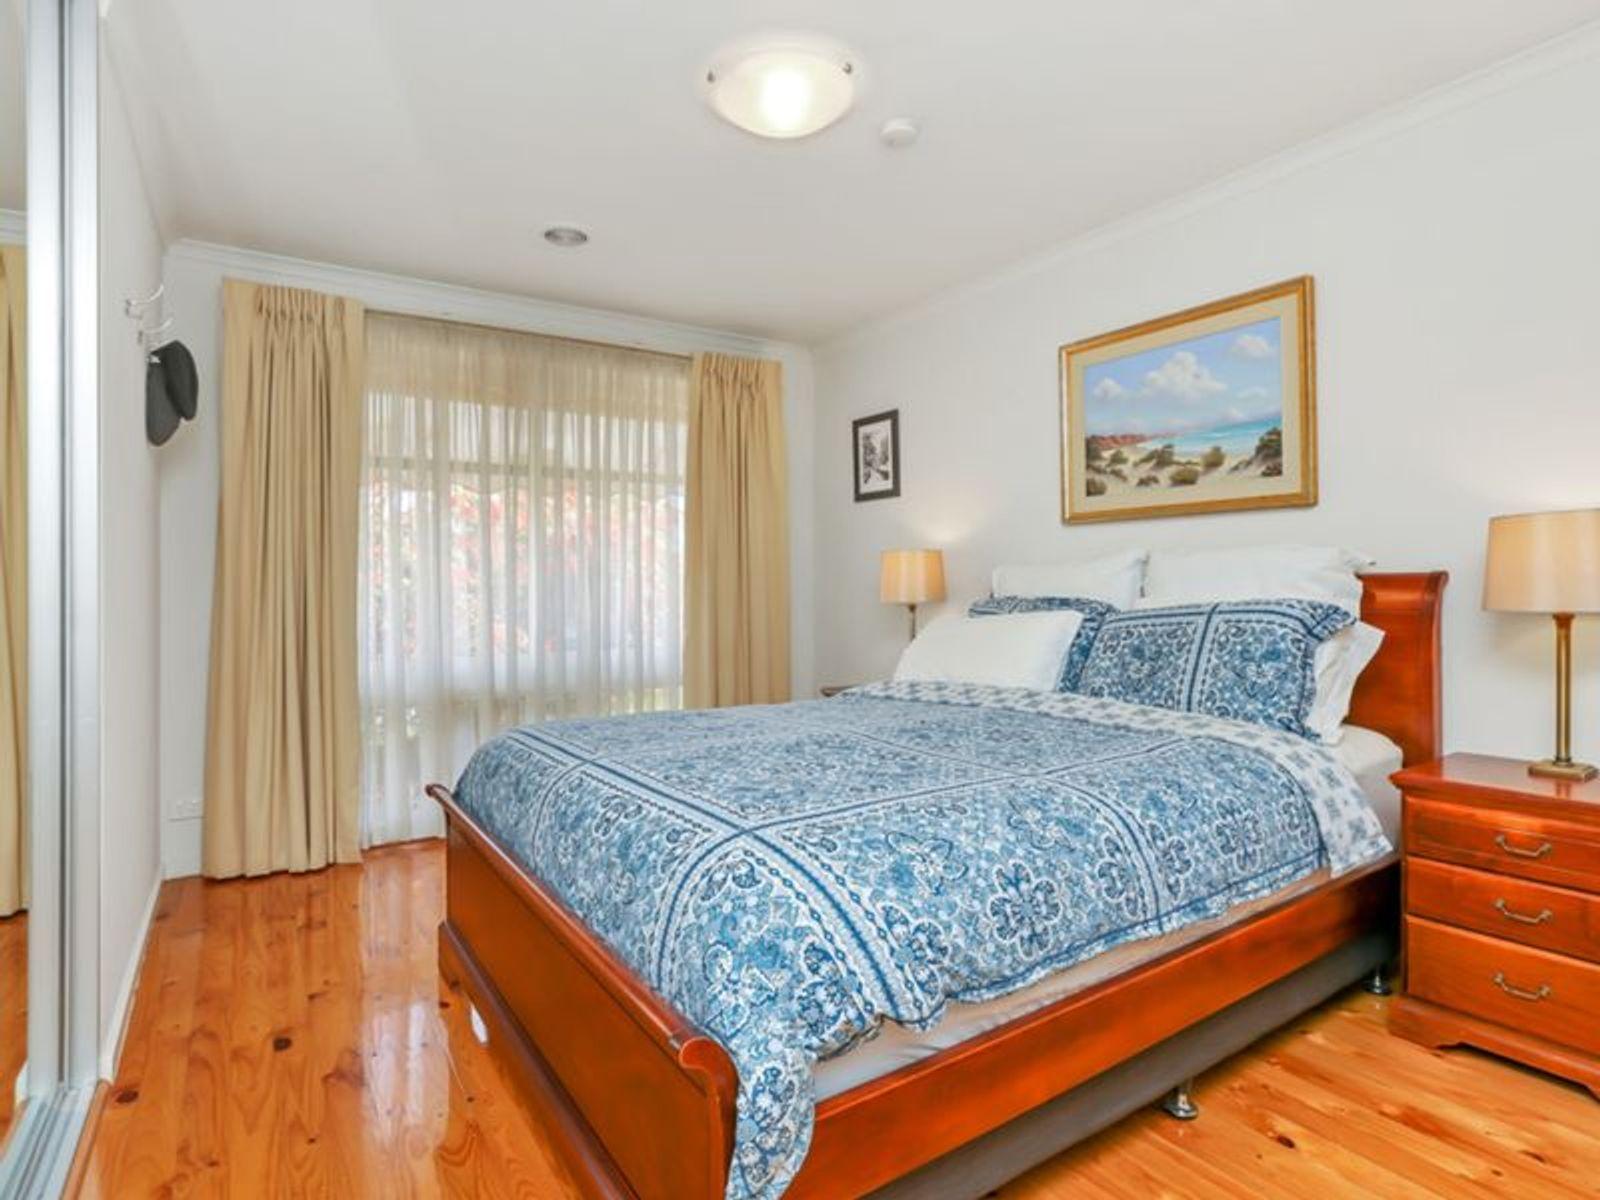 5 Alicante Avenue, Wynn Vale, SA 5127